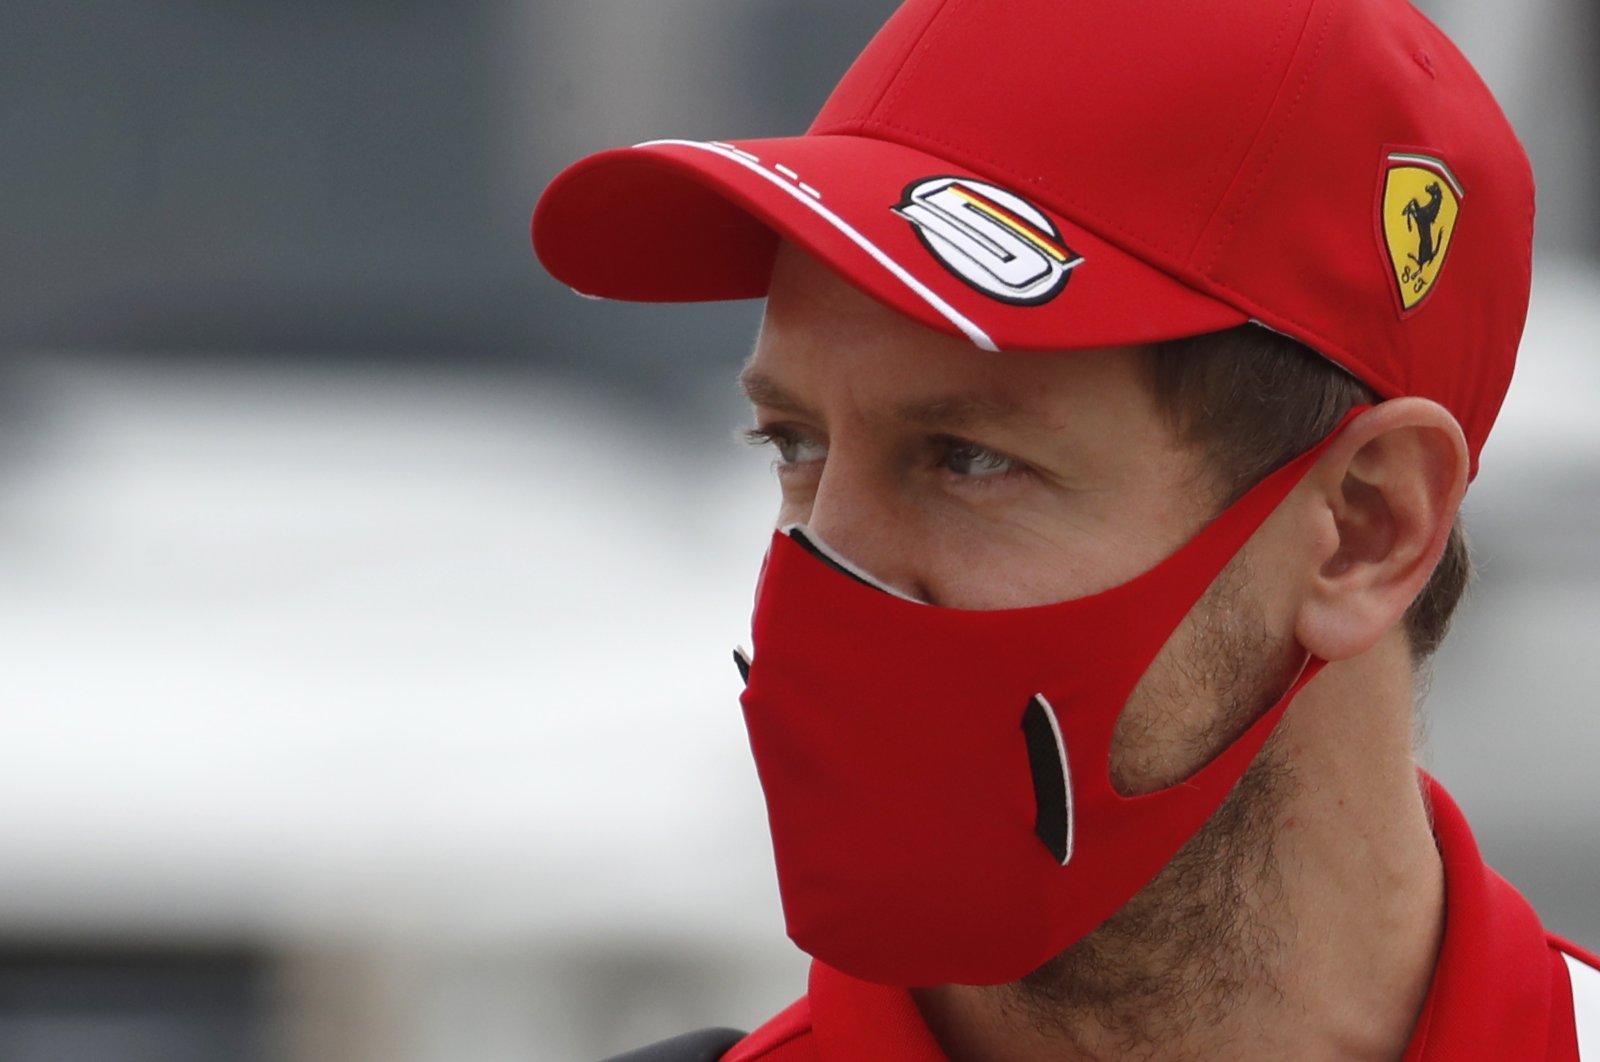 Then-Ferrari driver Sebastian Vettel at the first free practice at the Formula One Bahrain International Circuit in Sakhir, Bahrain, Nov. 27, 2020. (AP Photo)